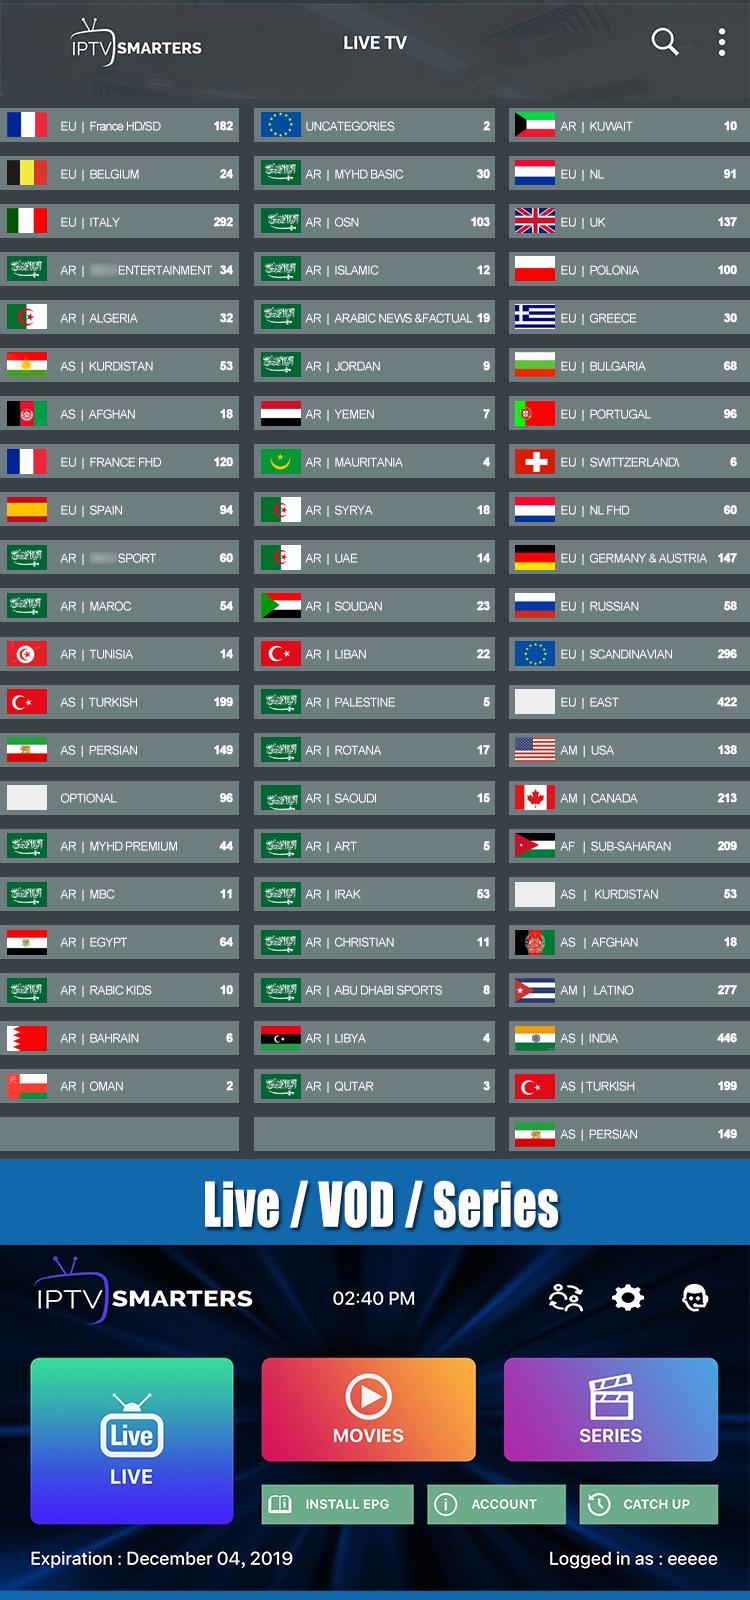 Asia europea iptv USA Iptv rivenditore 50 Paesi 5000 in diretta e vod iptv canale code1year m3u 12 mesi per la spedizione test